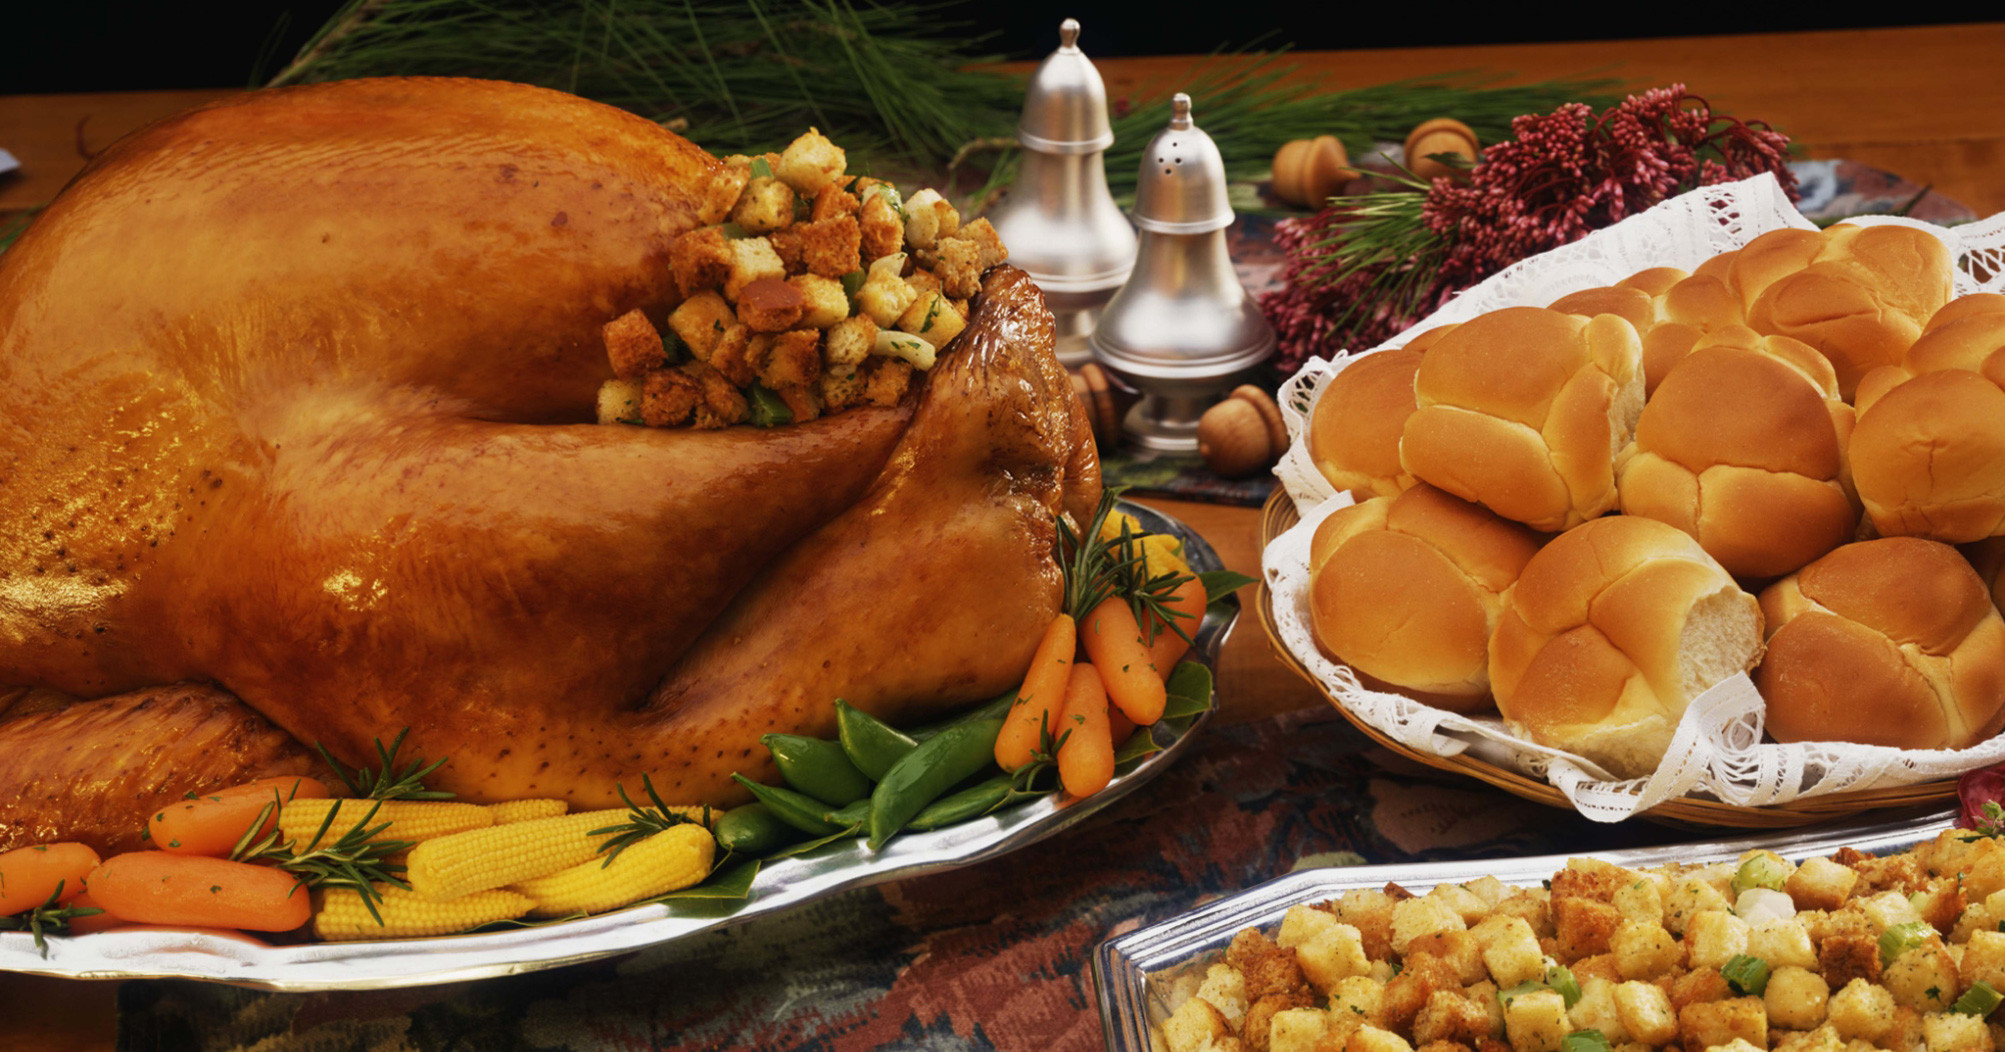 Luby'S Thanksgiving Dinner 2019  Mange Prie Shoppe un Thanksgiving à l américaine